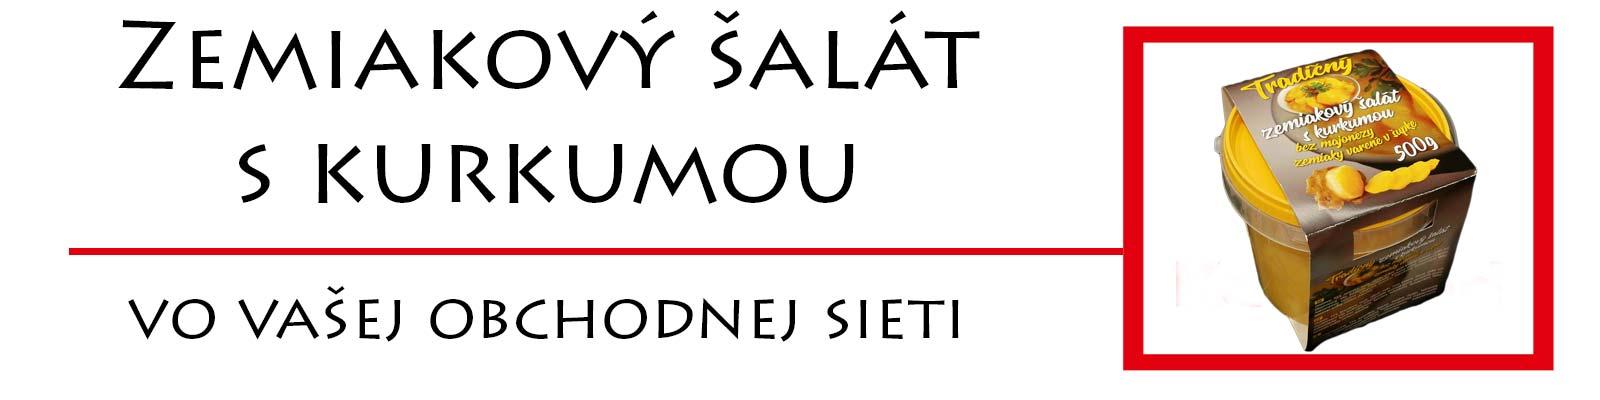 zemiakový-šalát-s-kurkumou